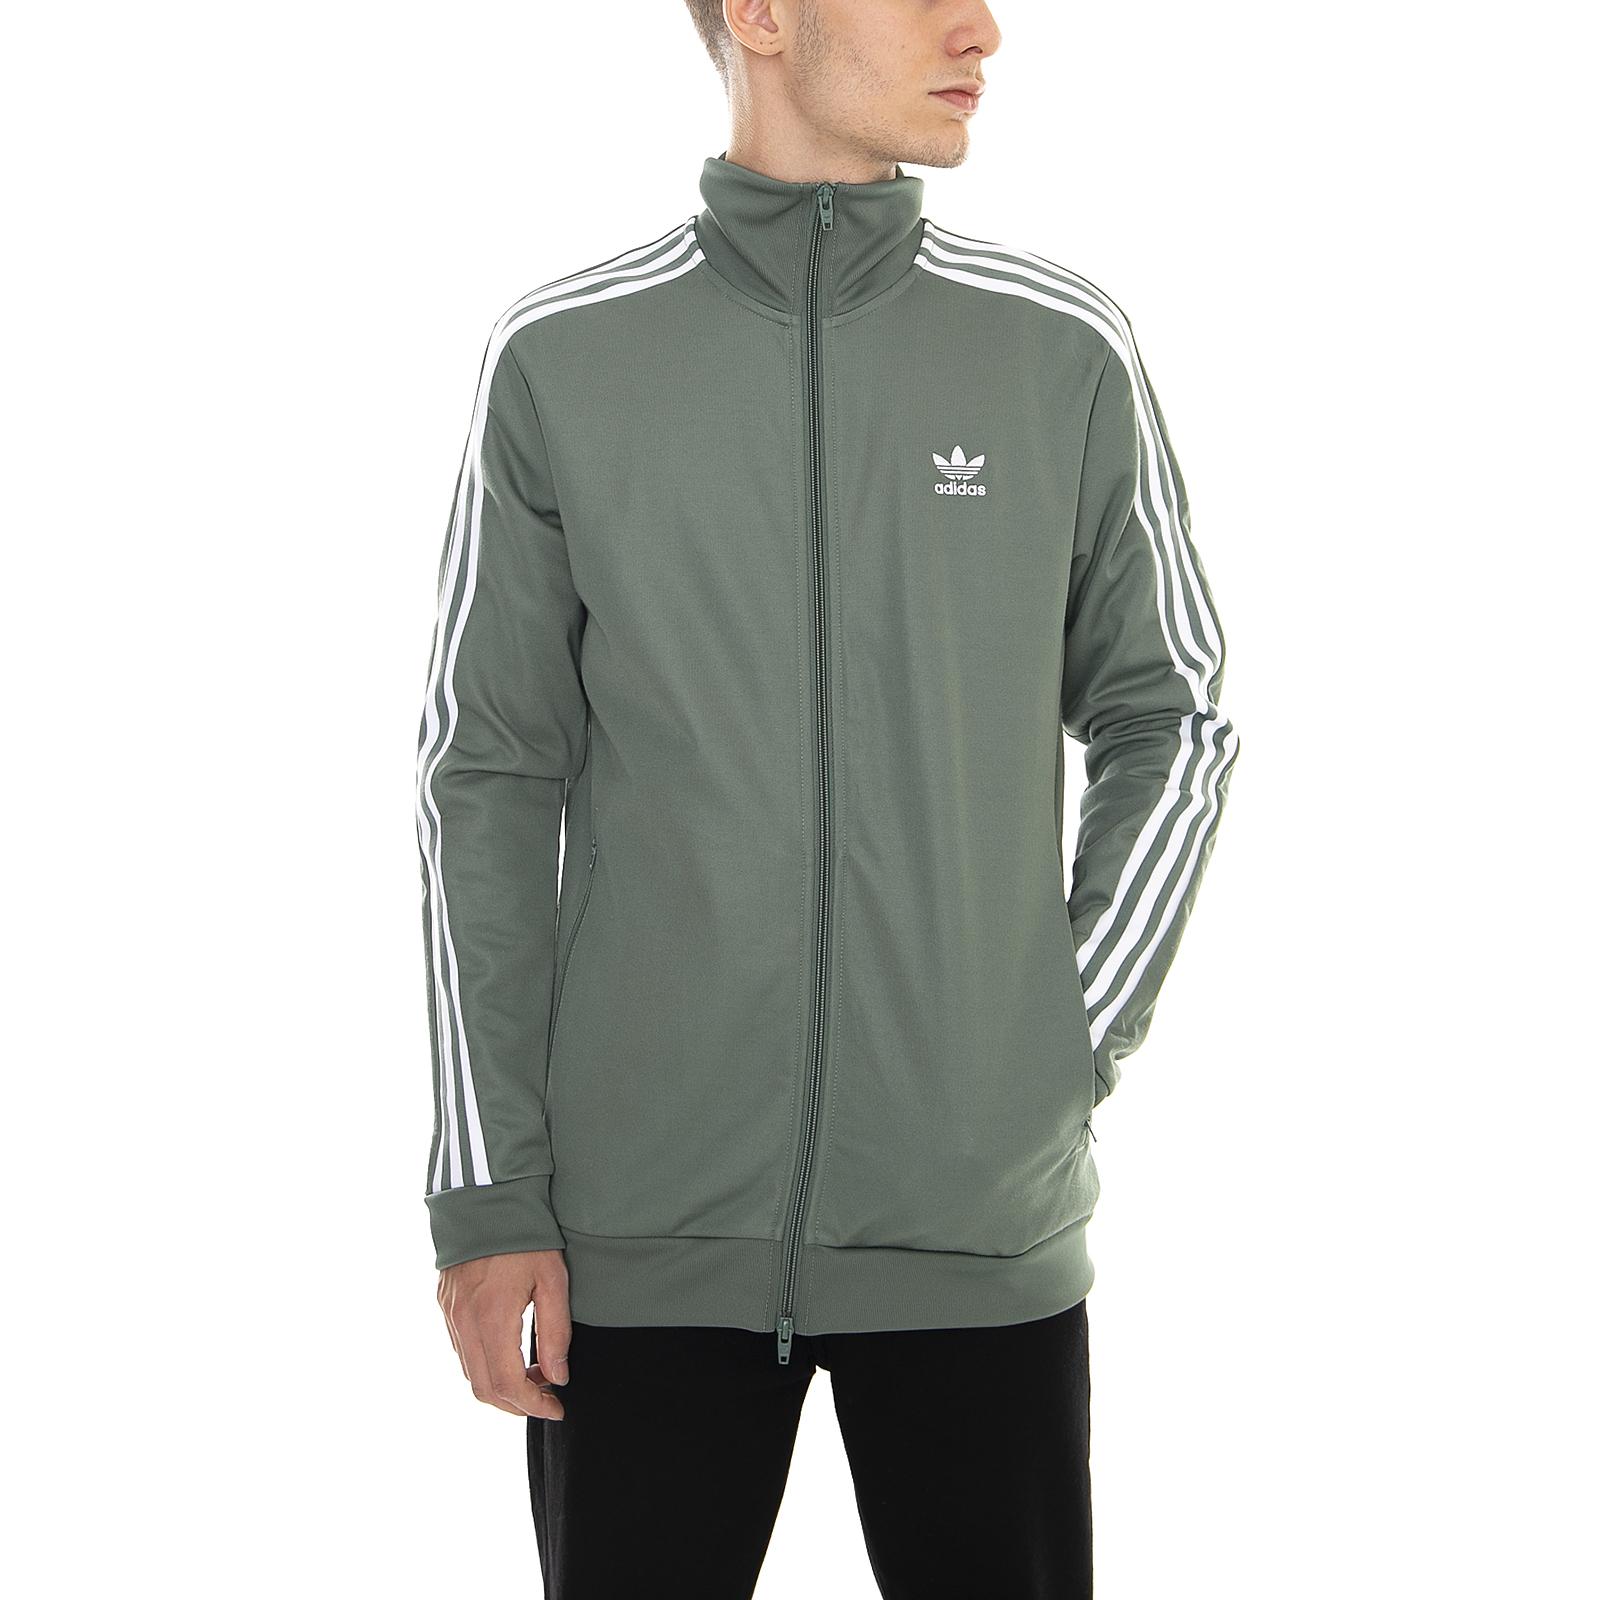 BECKENBAUER TT, Adidas Originals